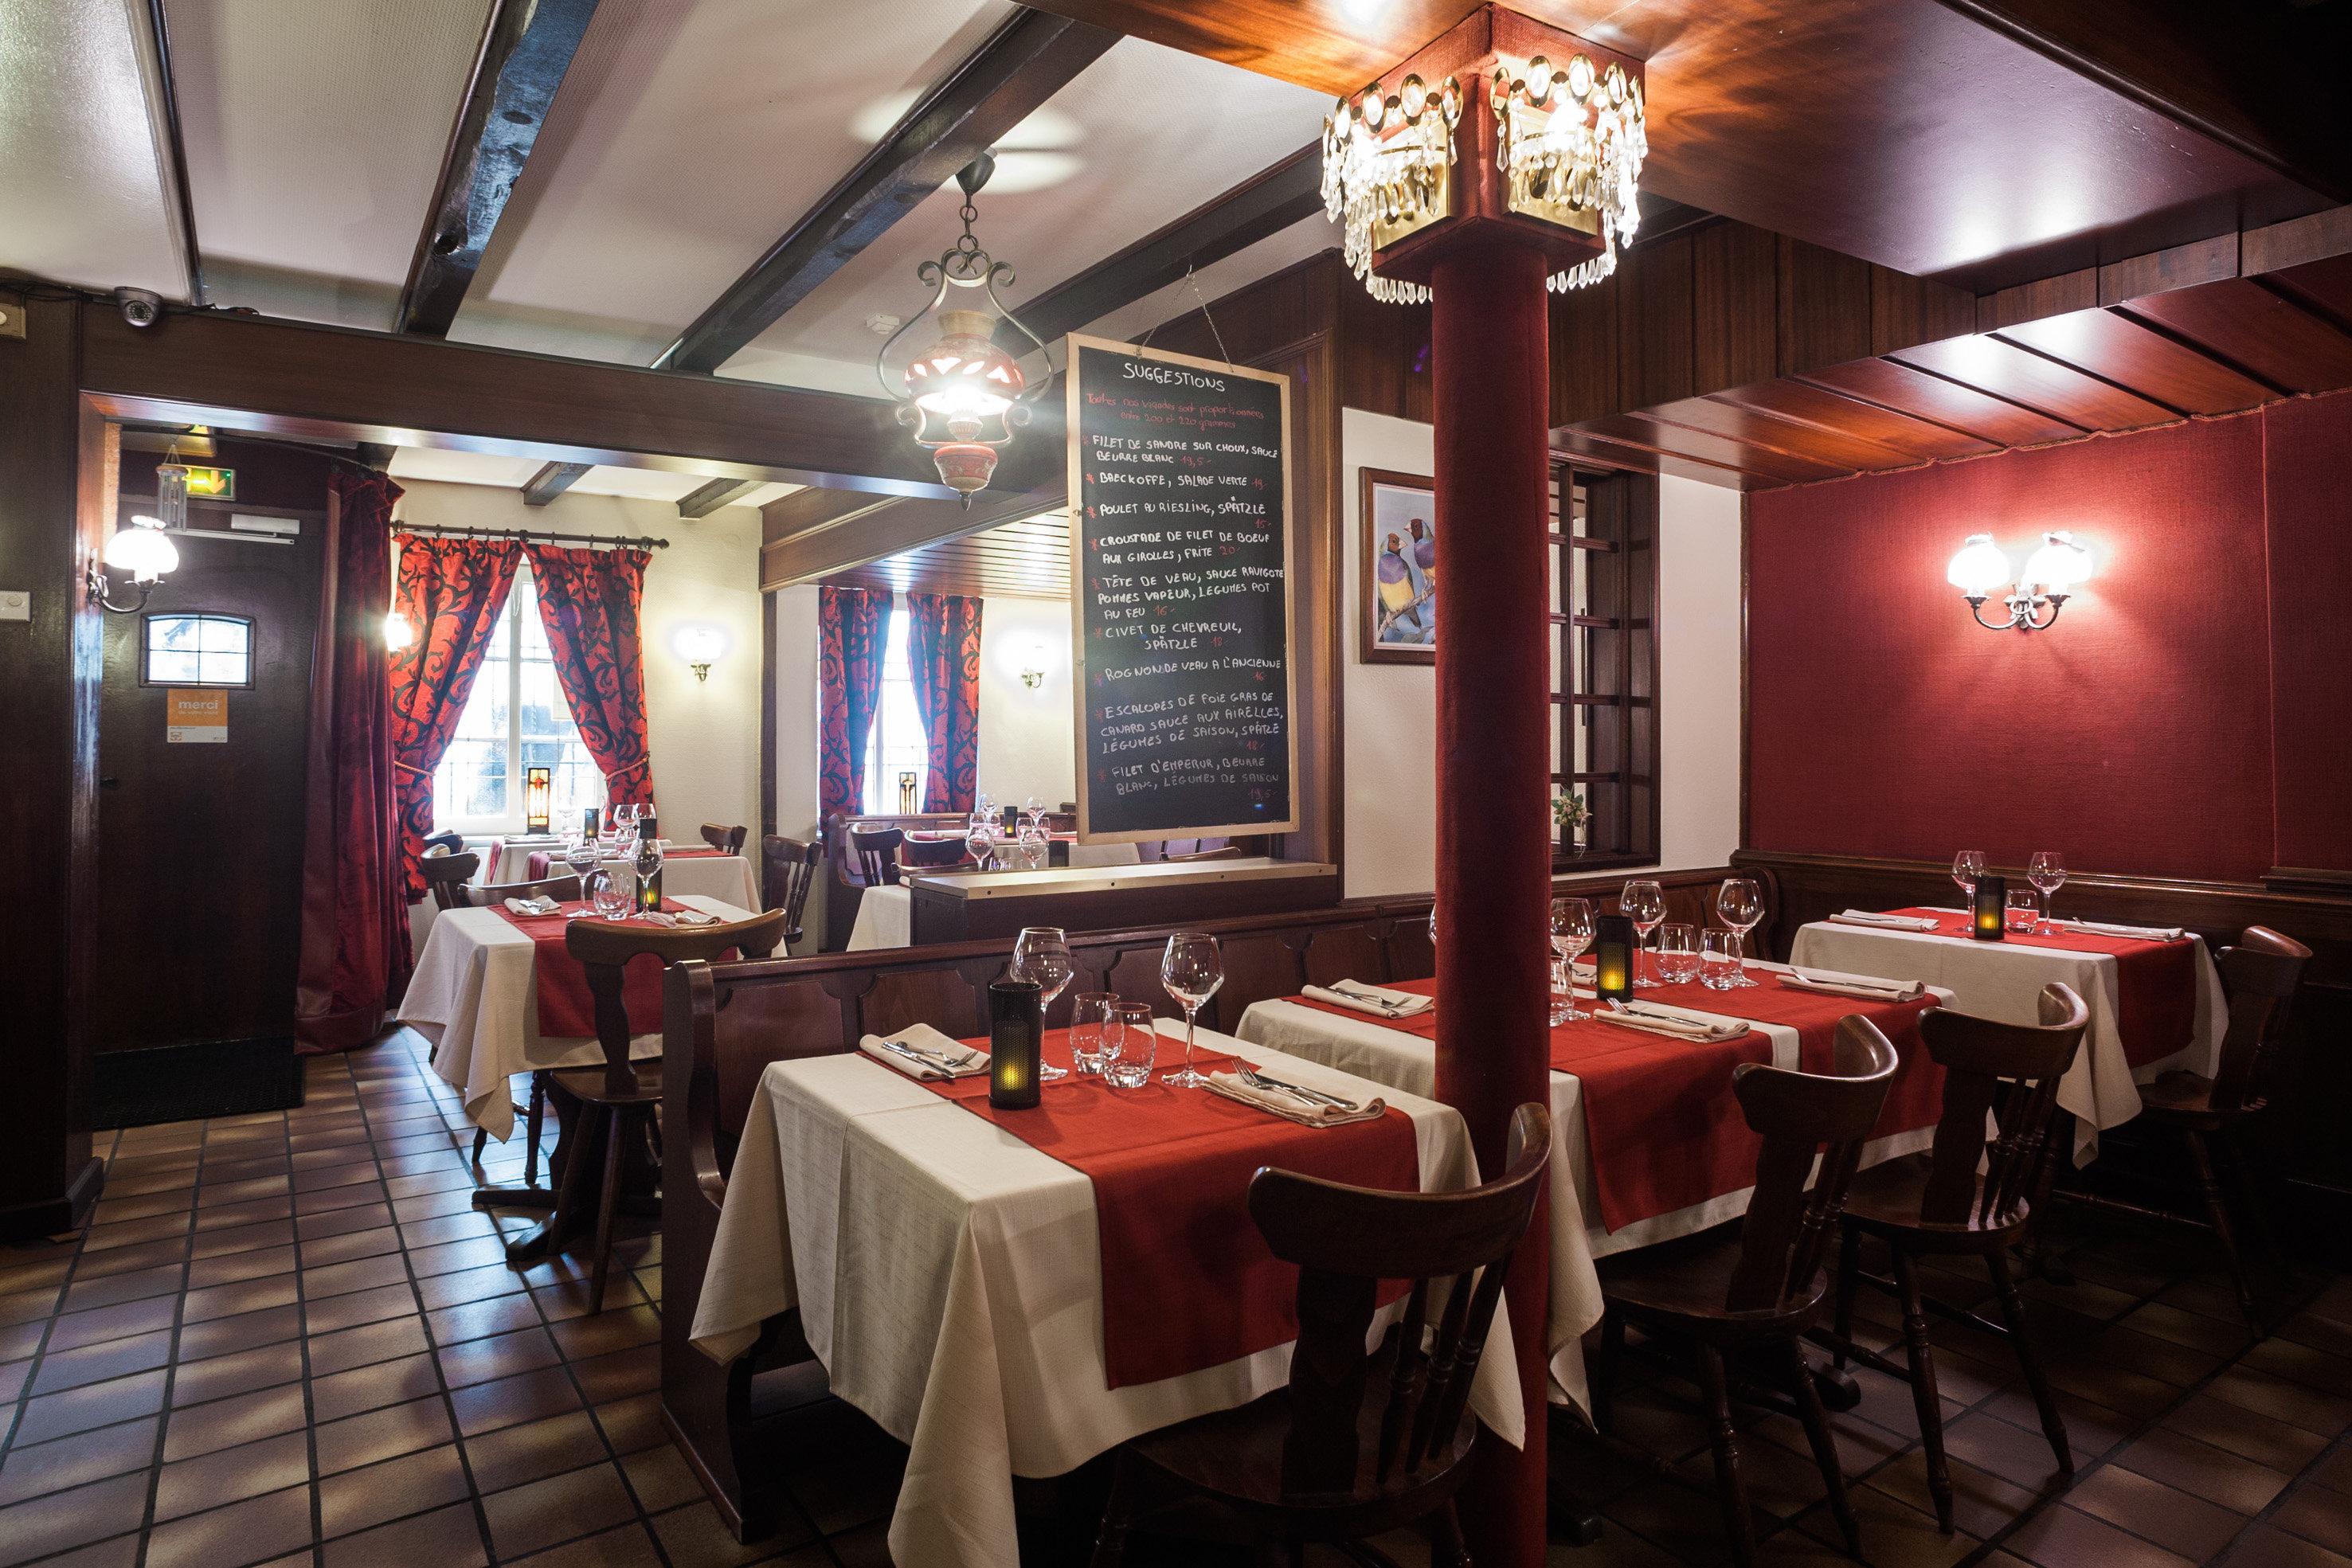 Galerie la petite alsace - Salon de la gastronomie strasbourg ...